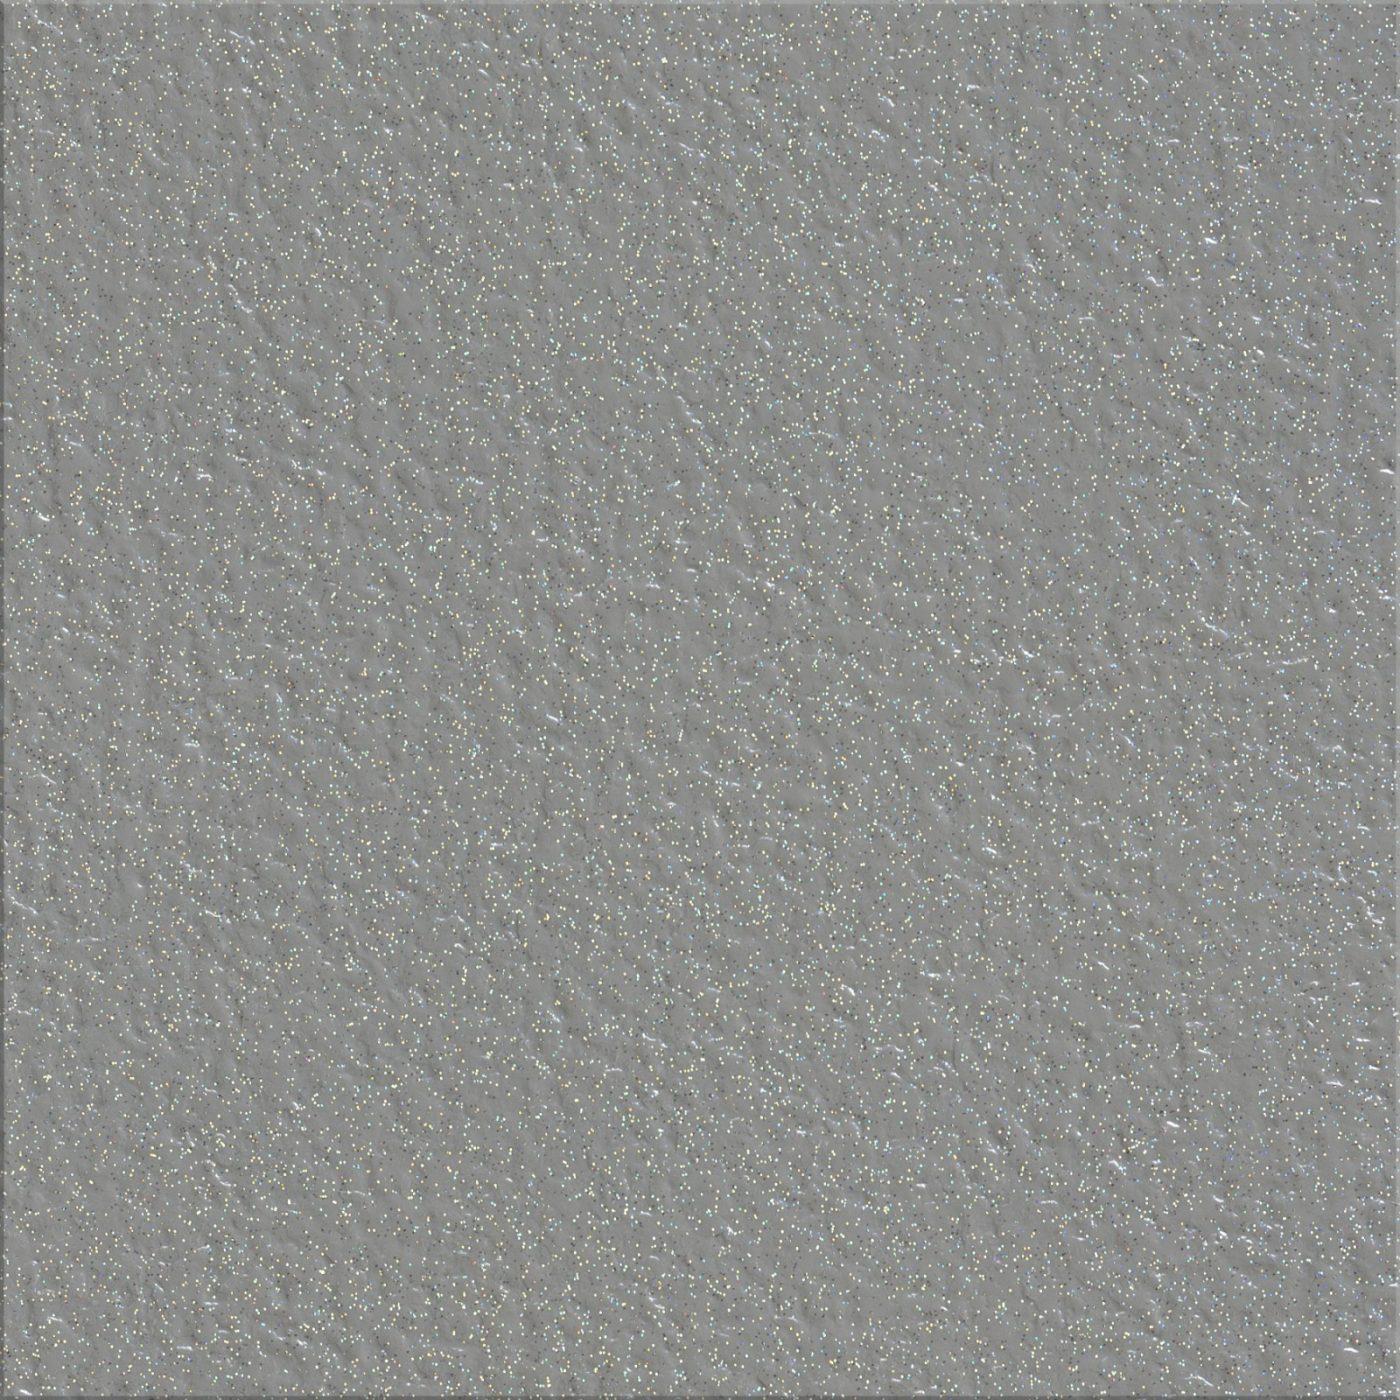 Stone Tile Sparkle Grey Qad Lvt 17 Luvanto Luxury Vinyl